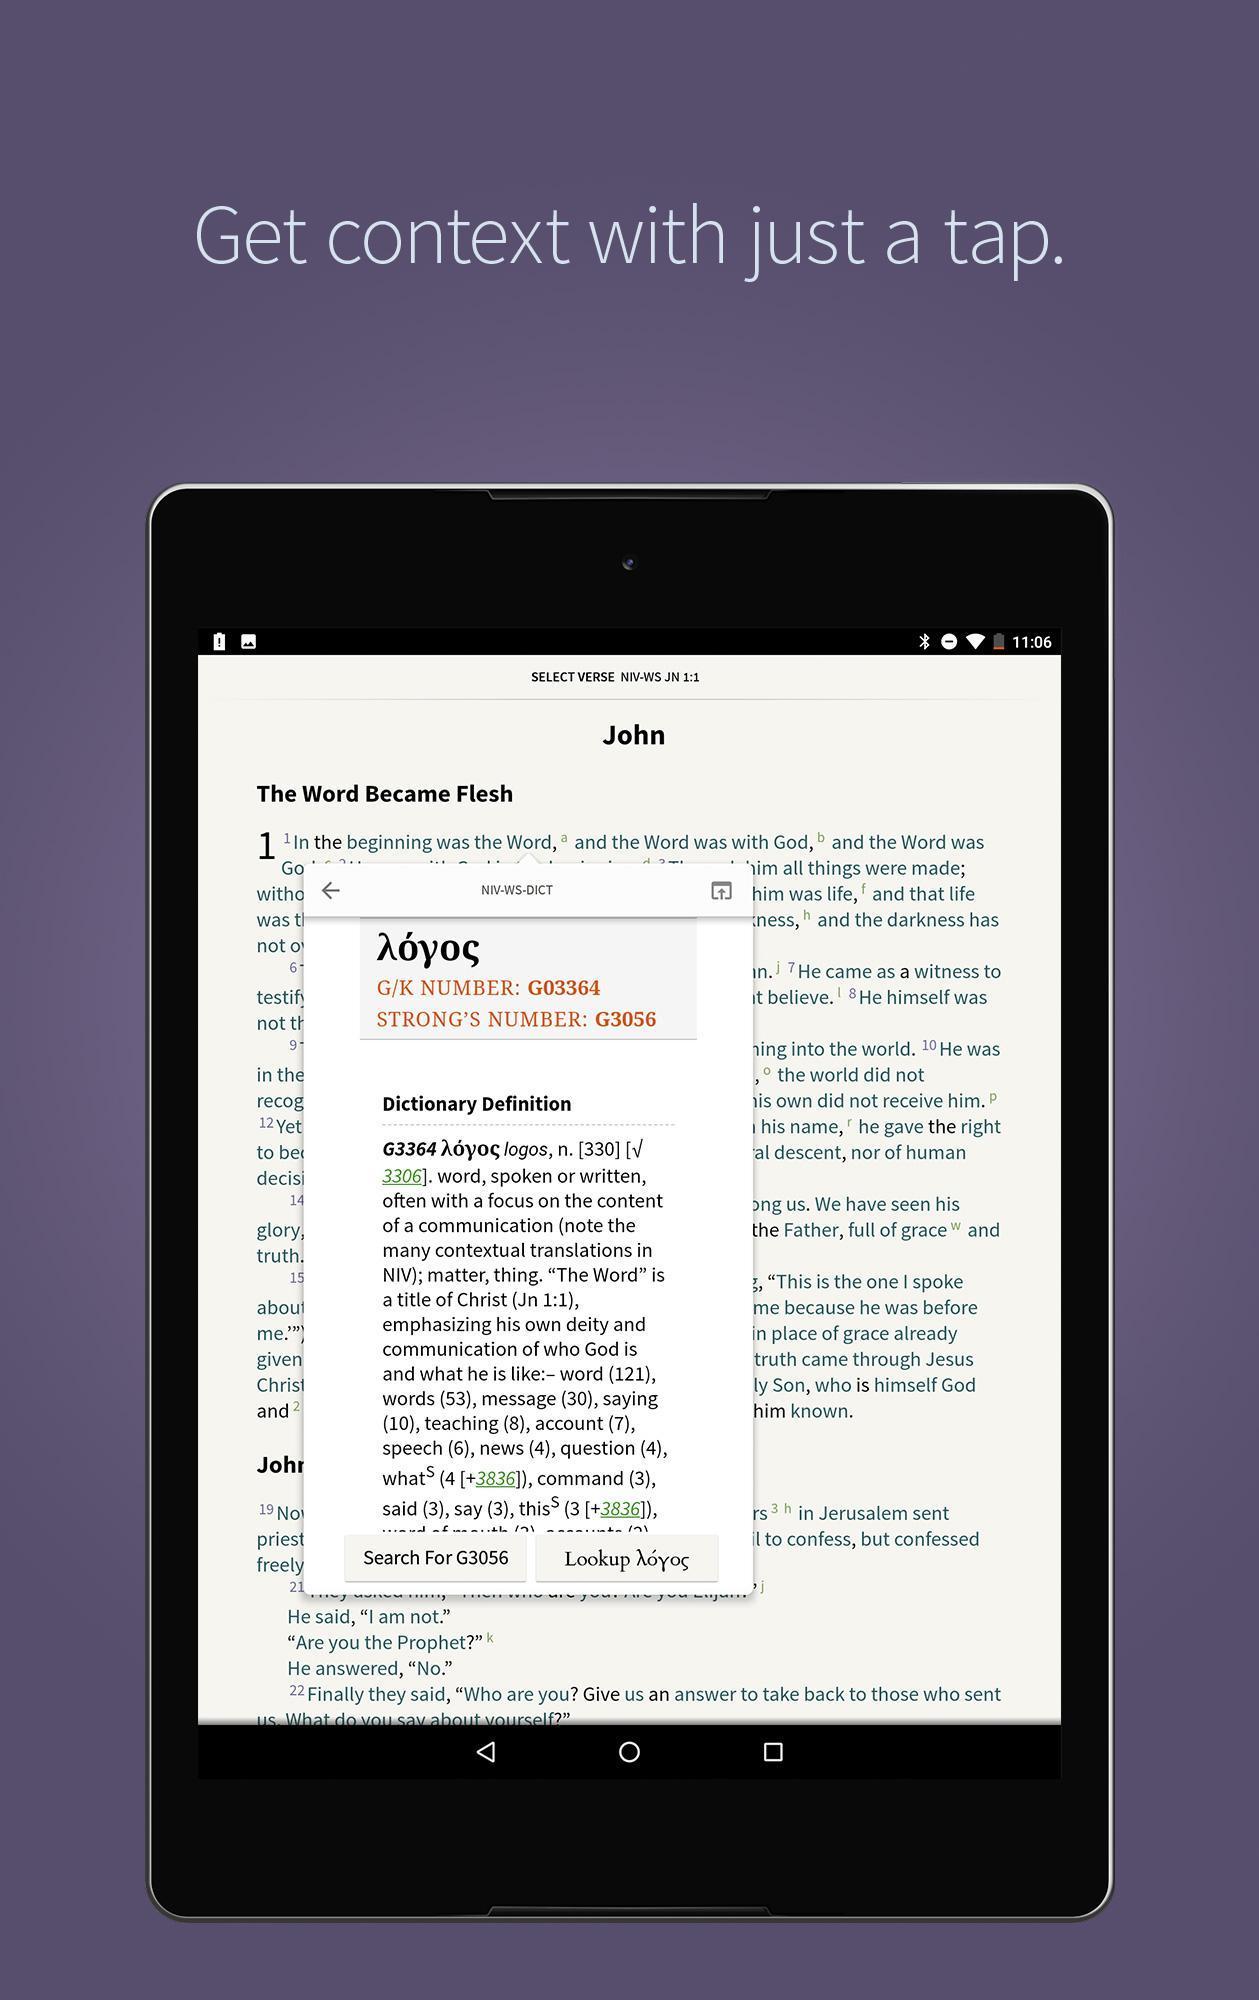 NKJV Bible by Olive Tree - Offline, Free & No Ads for